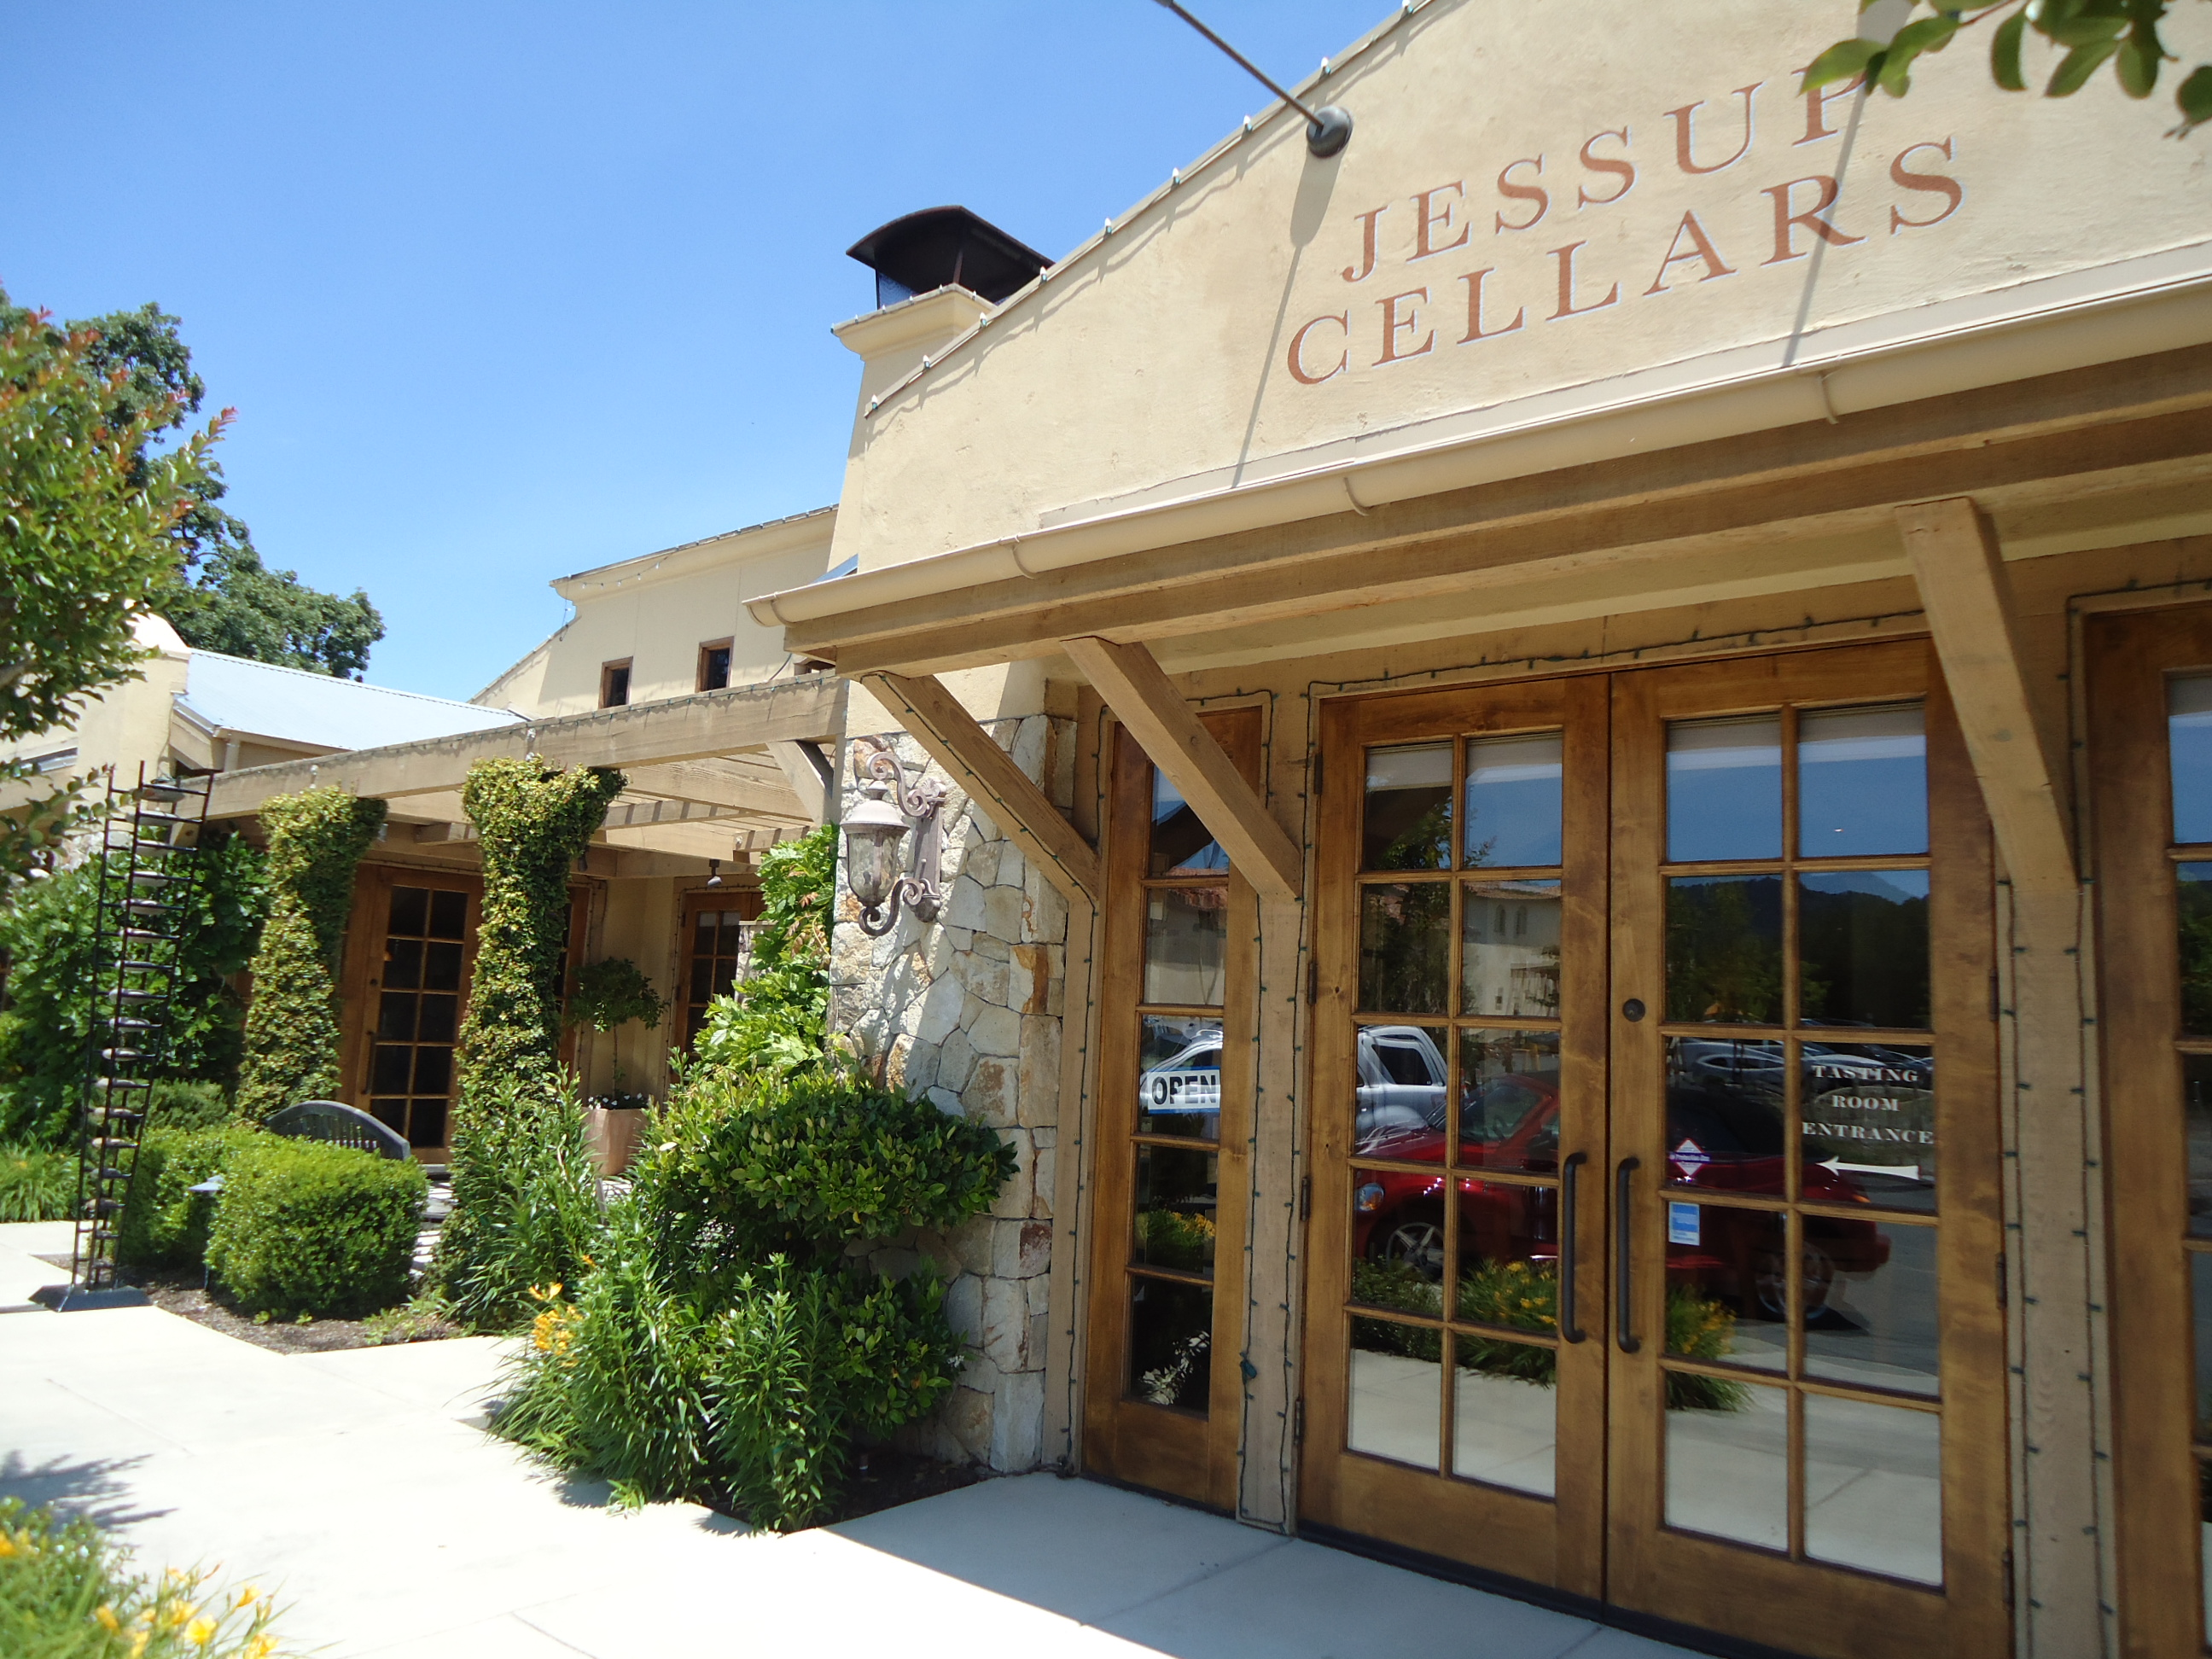 Jessup Cellars